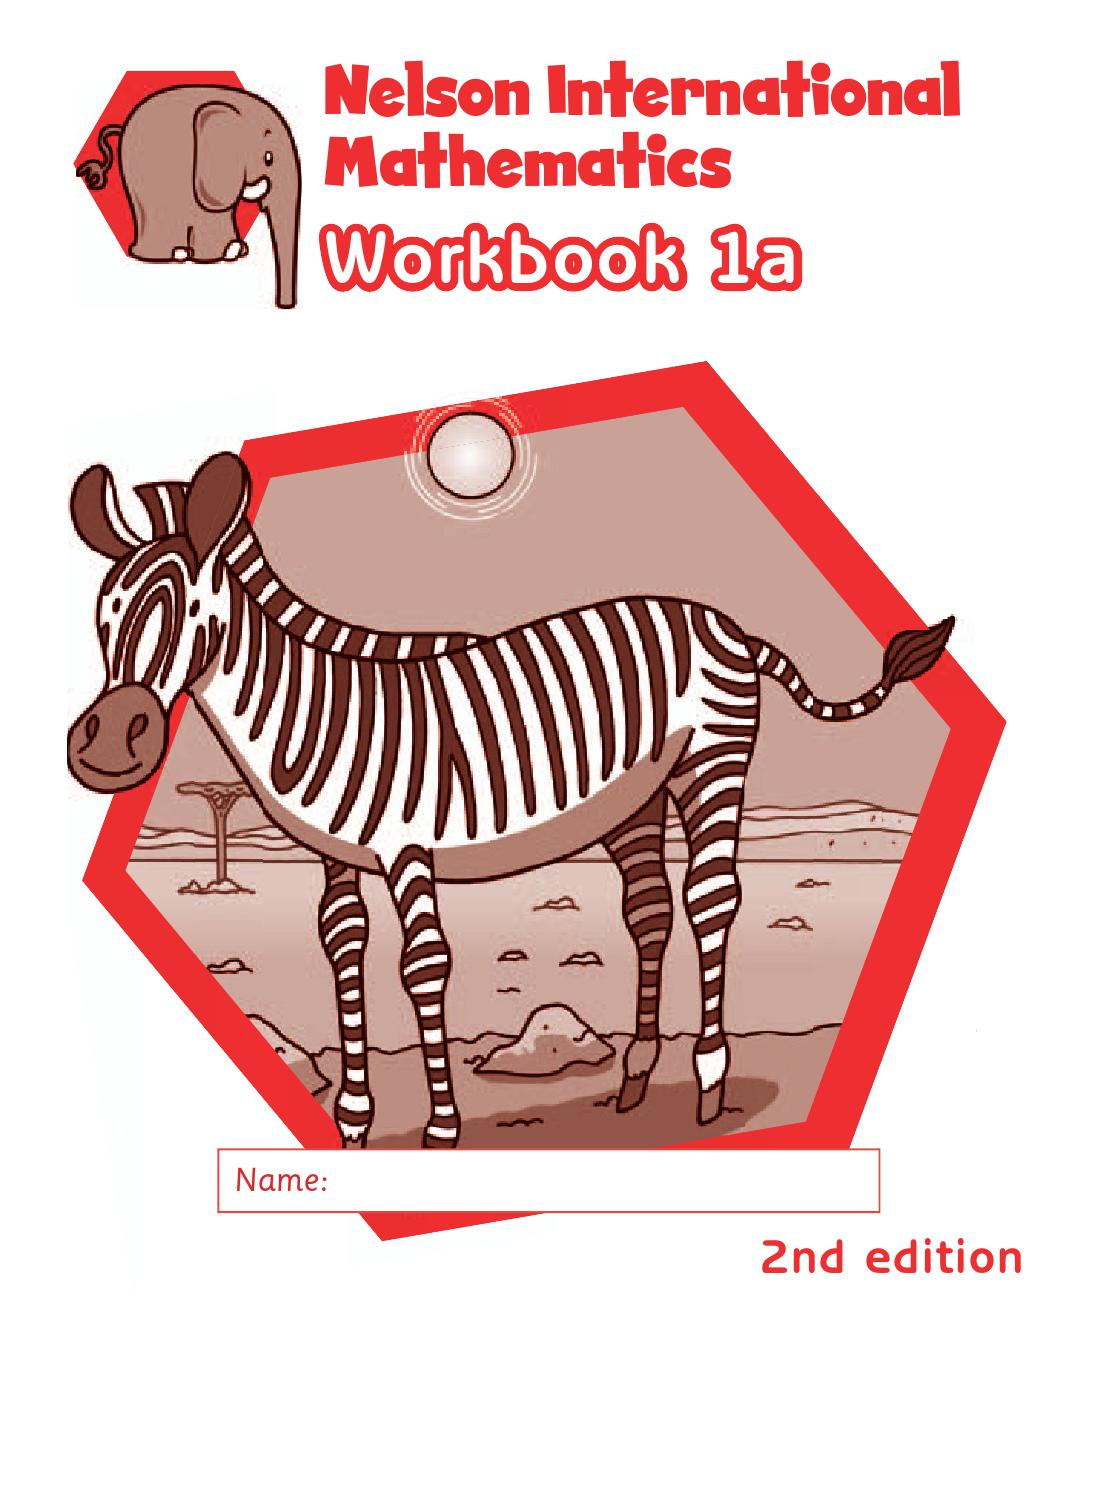 Nelson international maths workbook 1a answers by hany mufeid - issuu